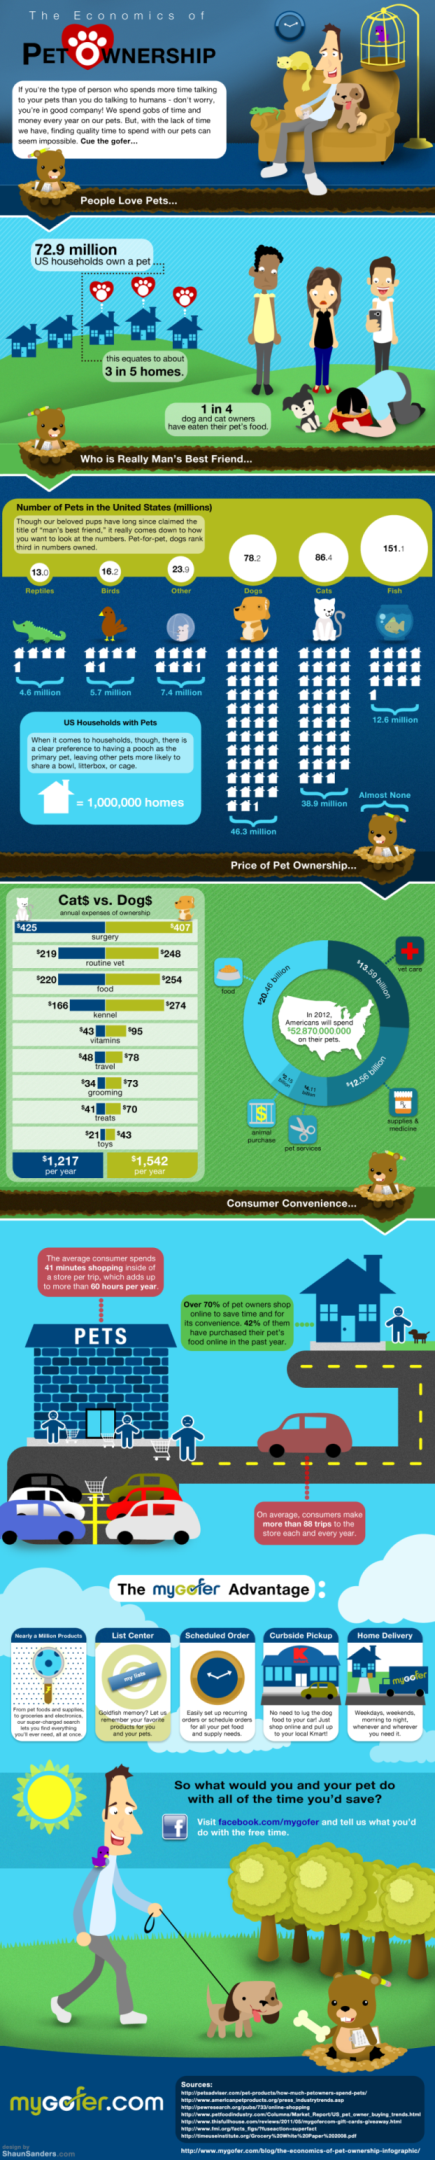 4. The Economics of pet ownership